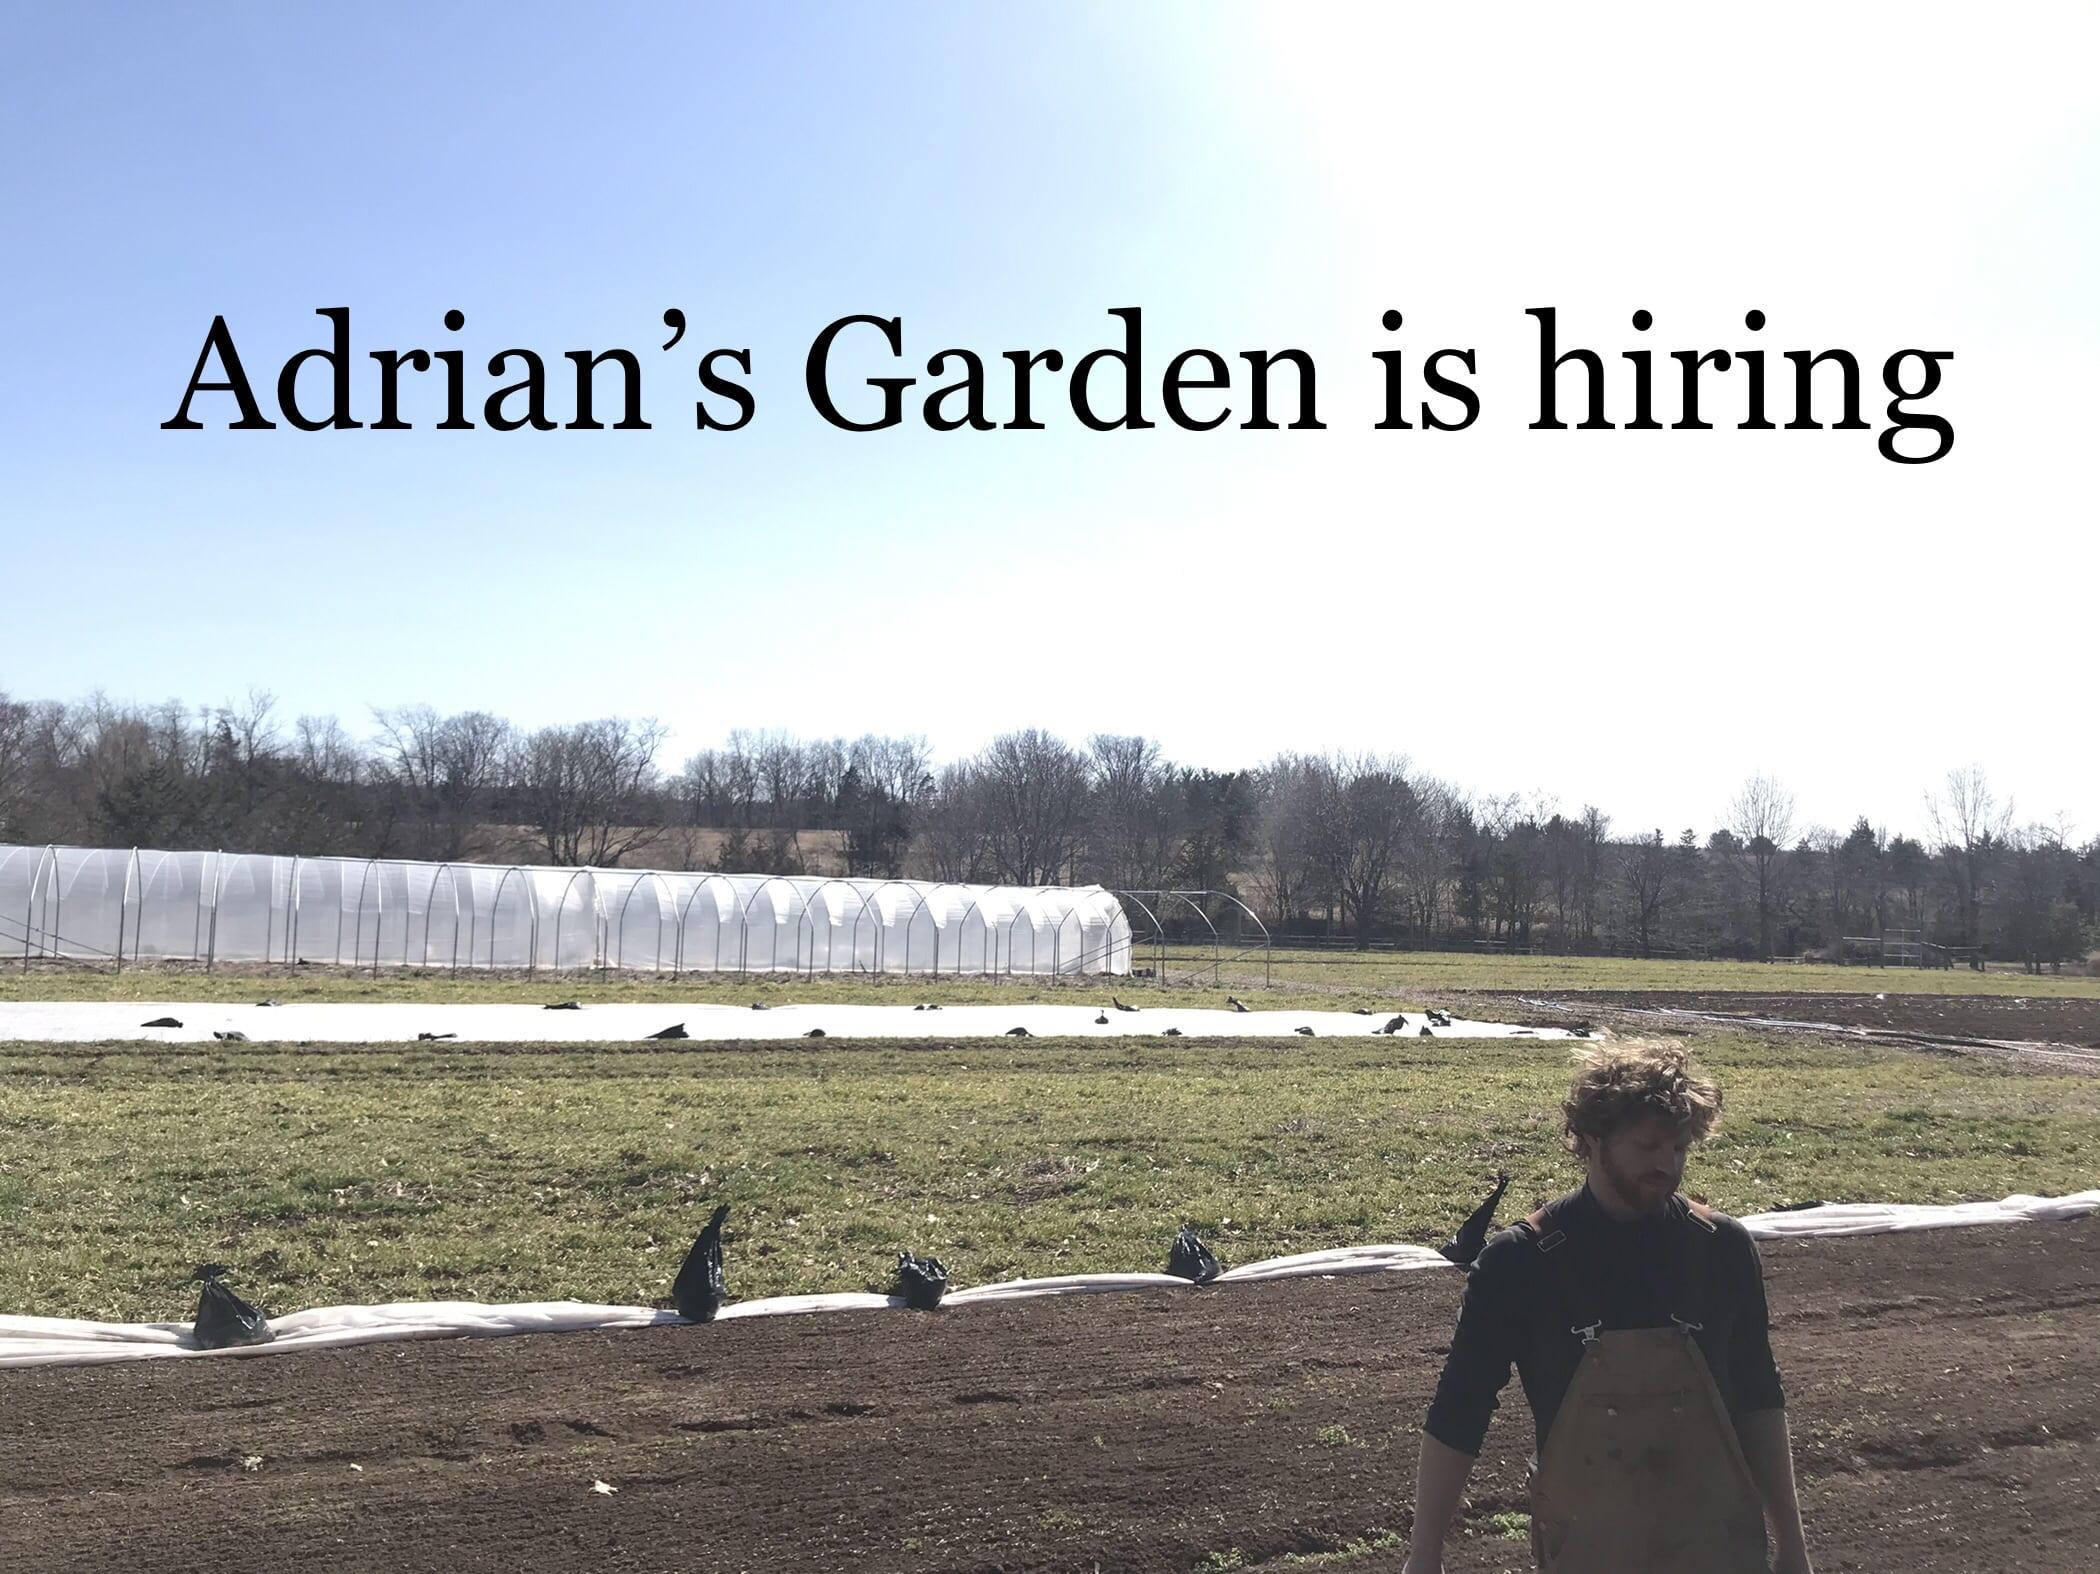 Hiring a Part-Time Farmer at Adrian's Garden, NJ